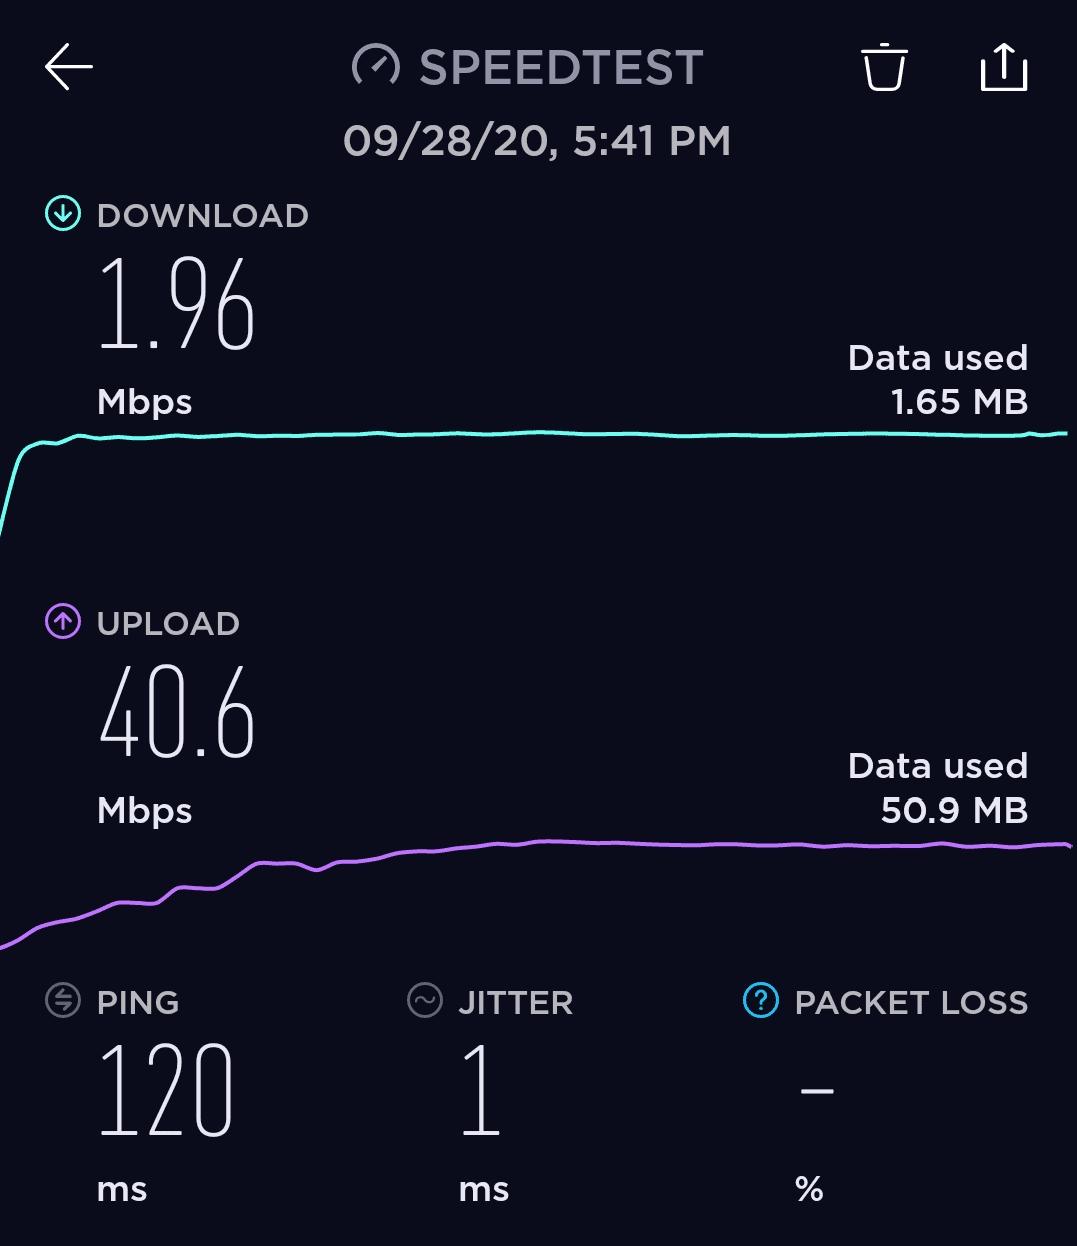 Speed test performed on a Thunder VPN German Server